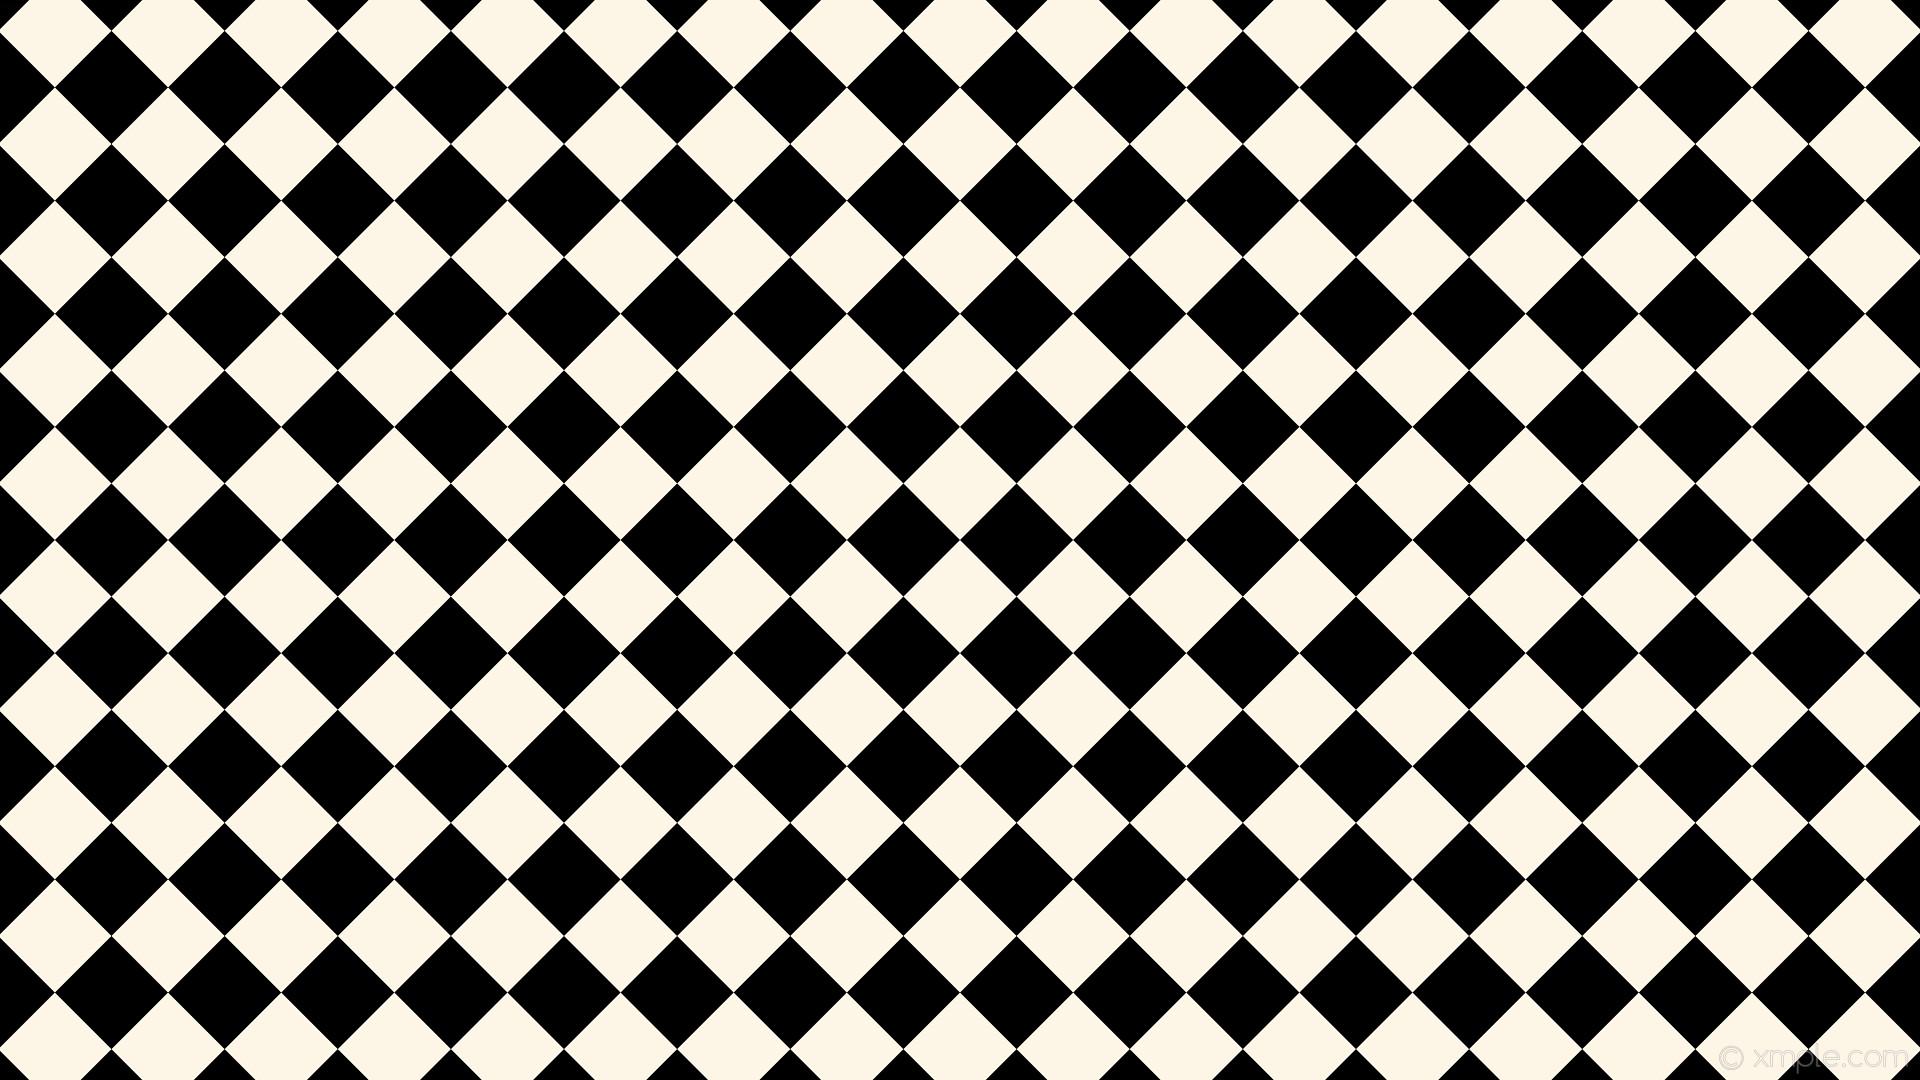 White square wallpaper